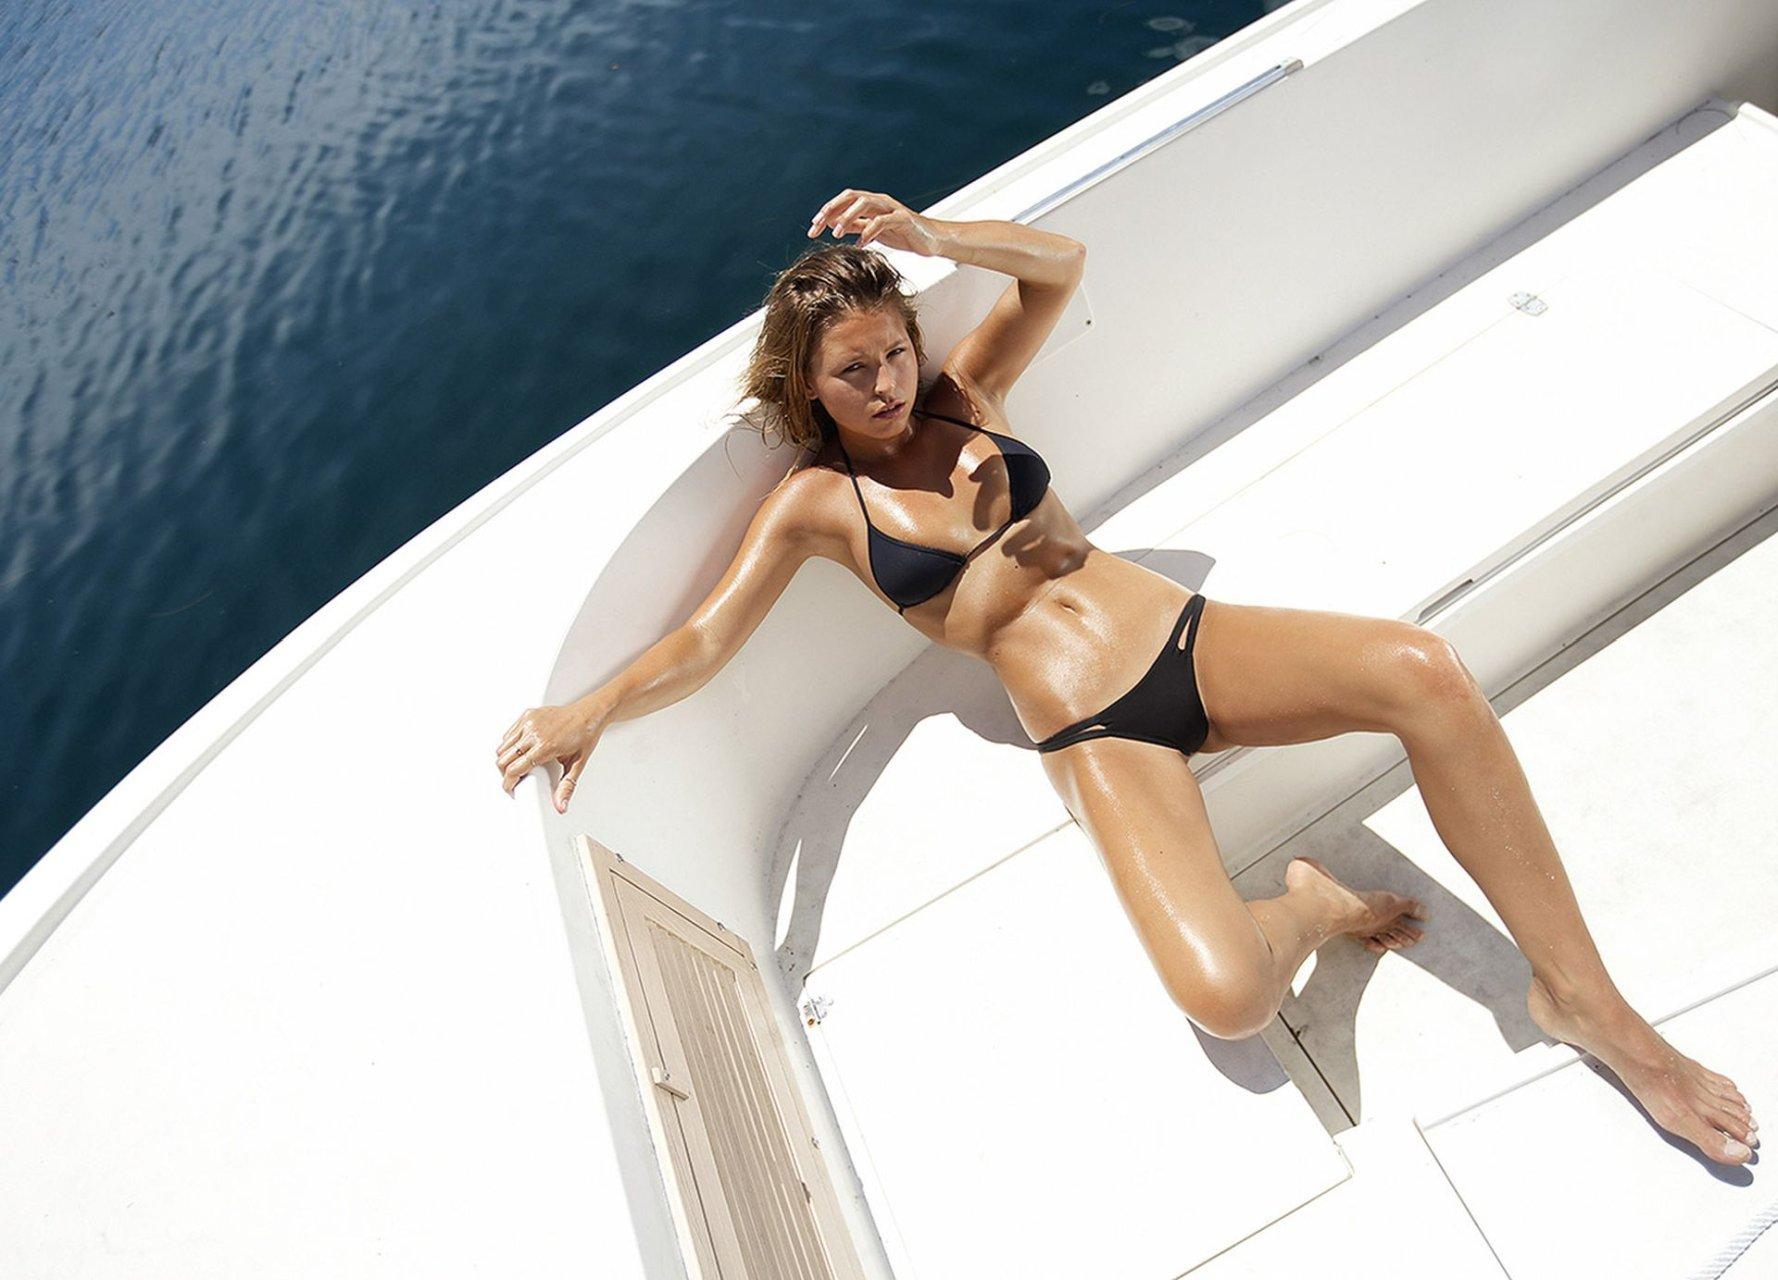 Marisa-Papen-Nude-Sexy-TheFappeningBlog.com-20.jpg